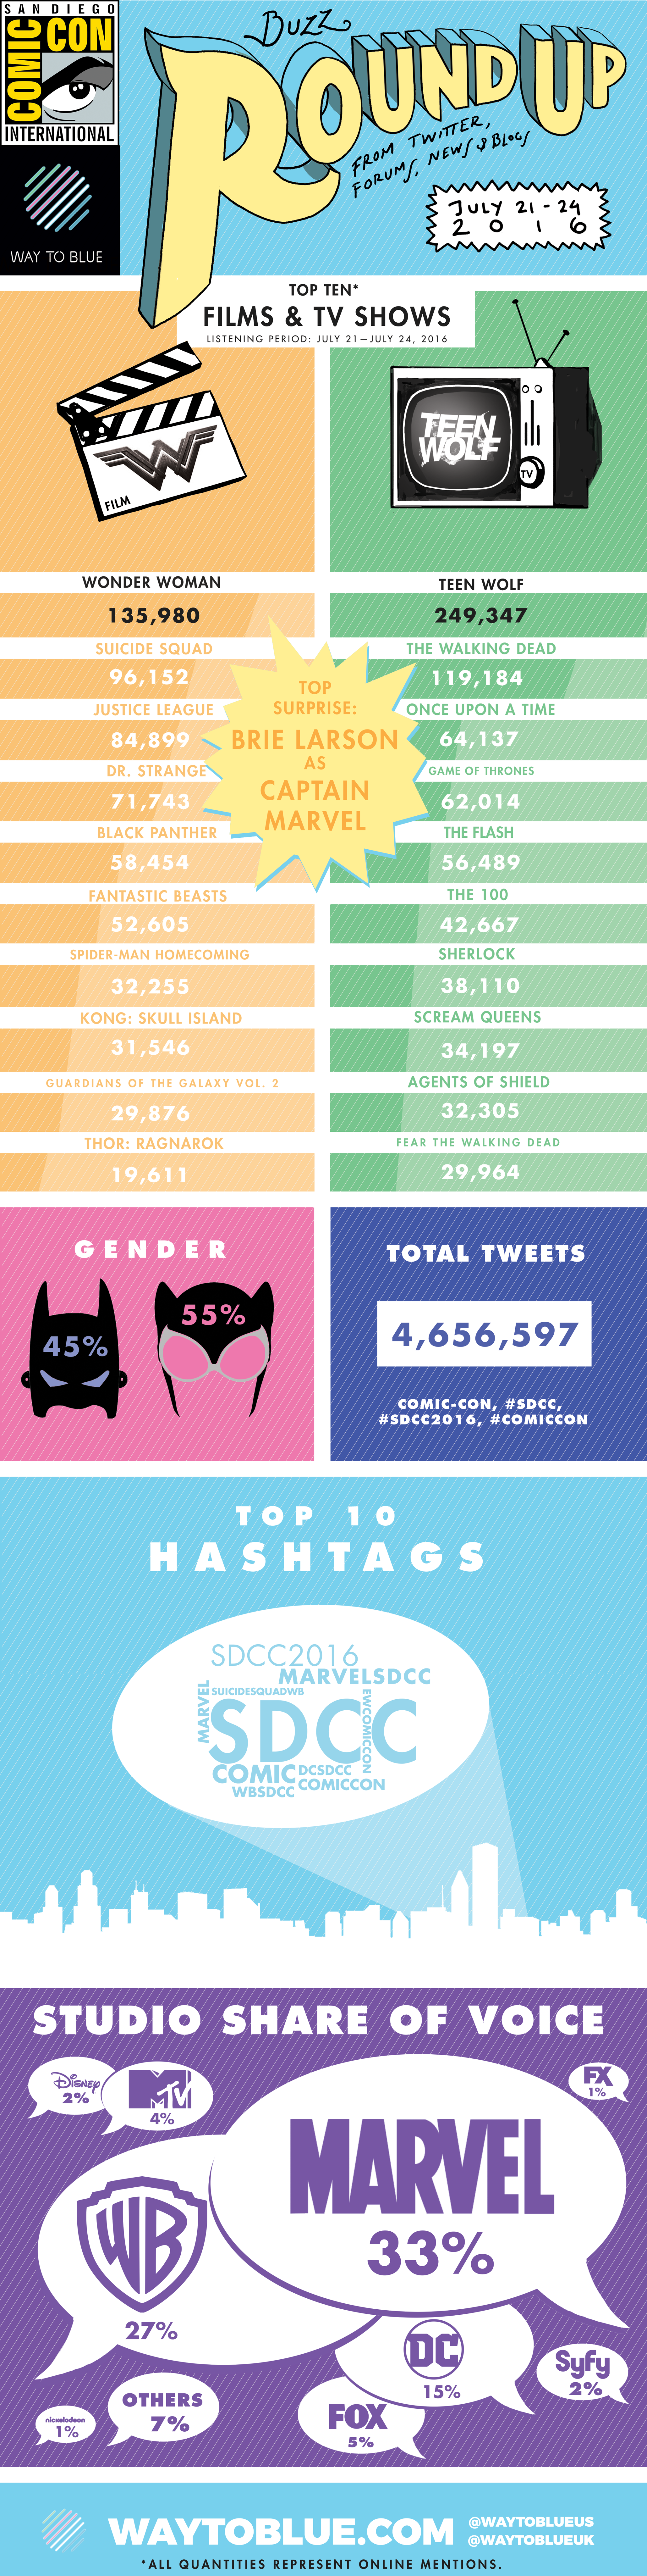 W2B_Infographic Social Buzz ComicCon 2016